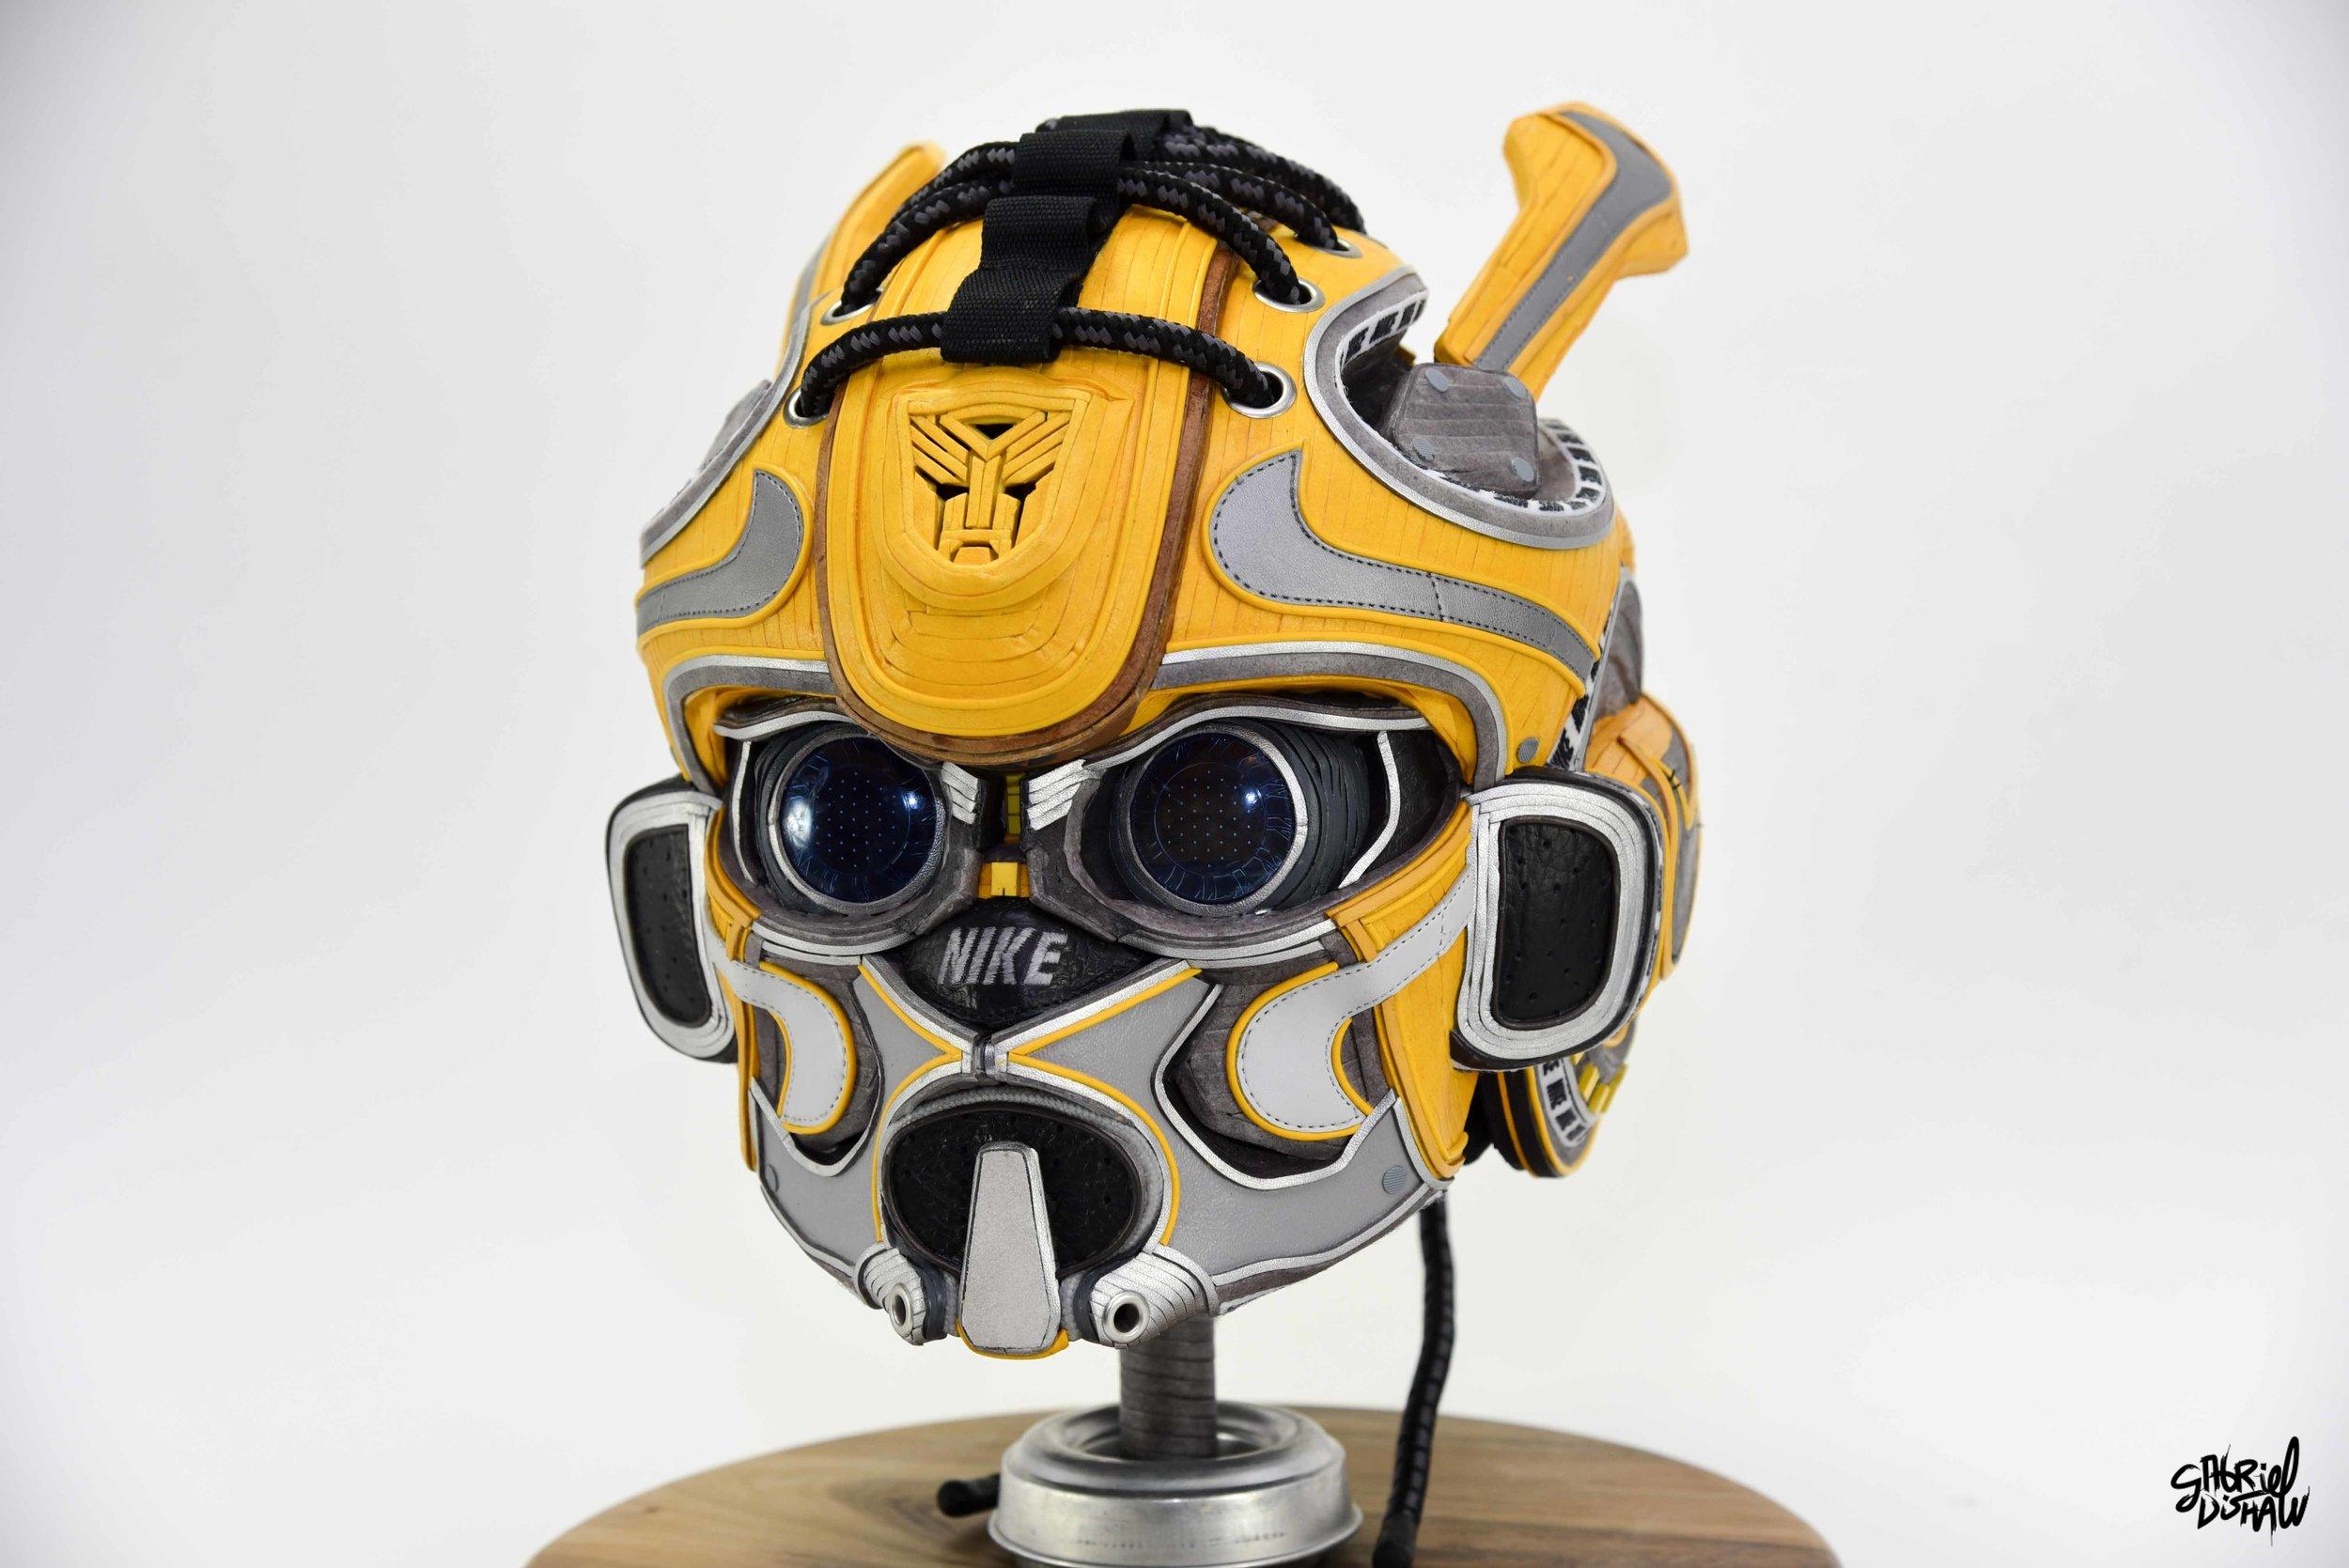 Gabriel Dishaw Bumblebee Swoosh-8349.jpg